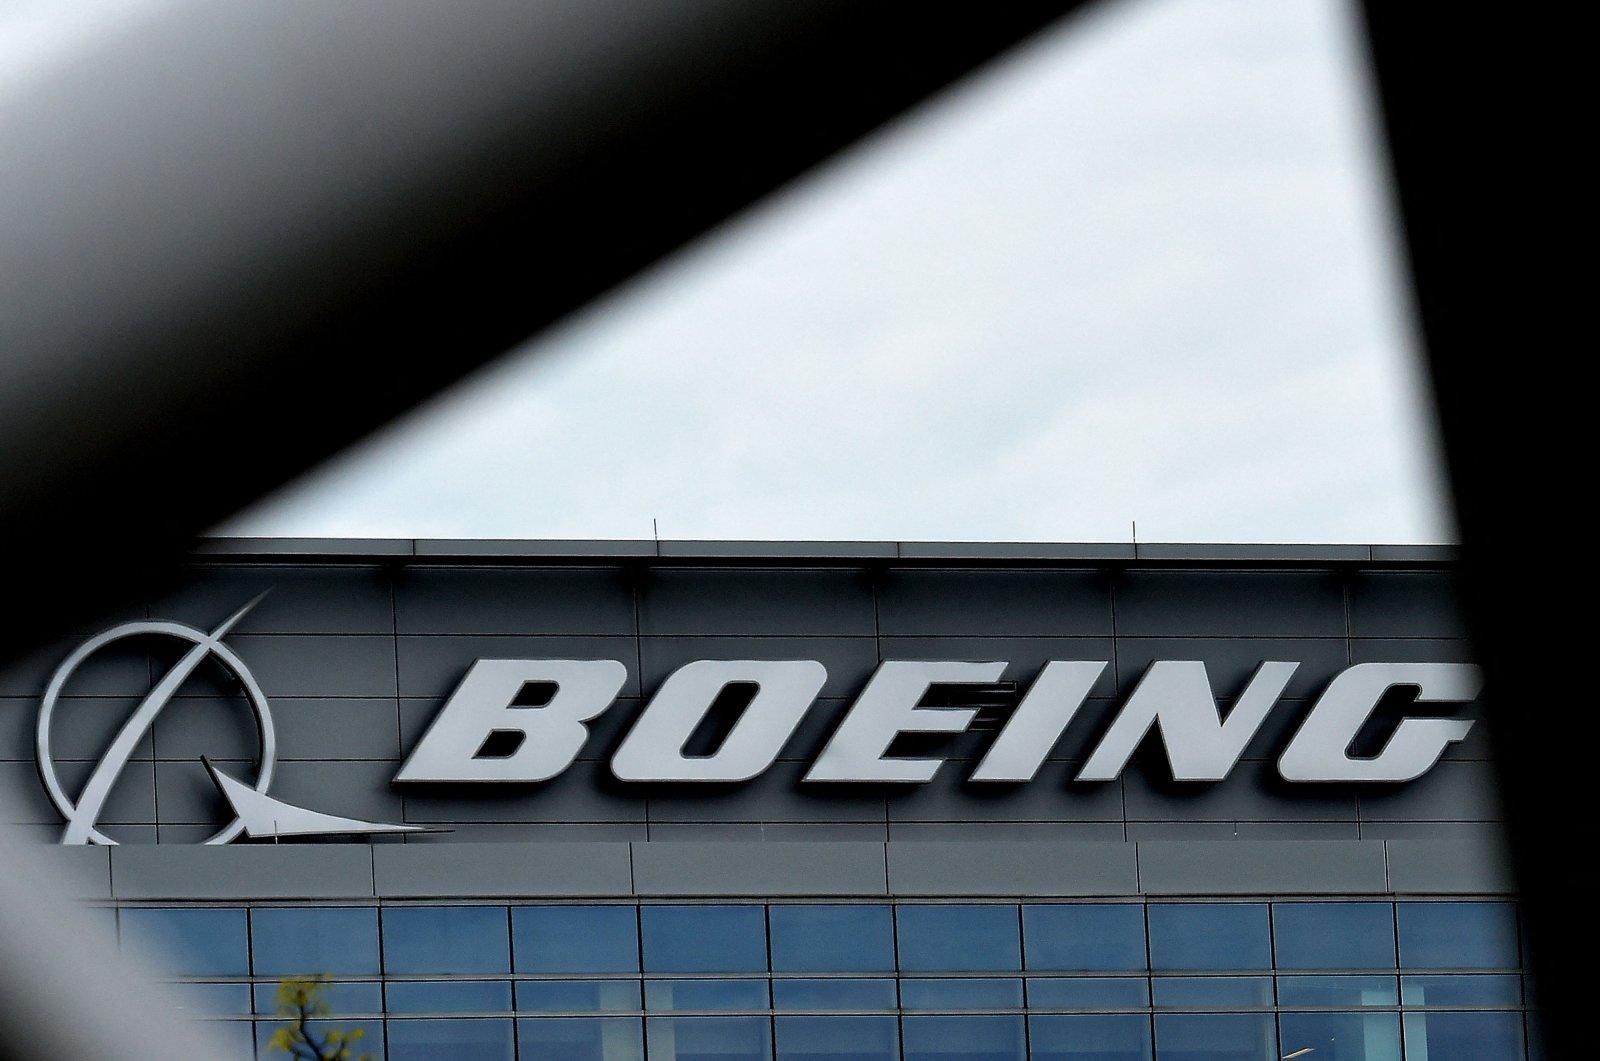 The Boeing regional headquarters on April 29, 2020, in Arlington, Virginia. (AFP Photo)